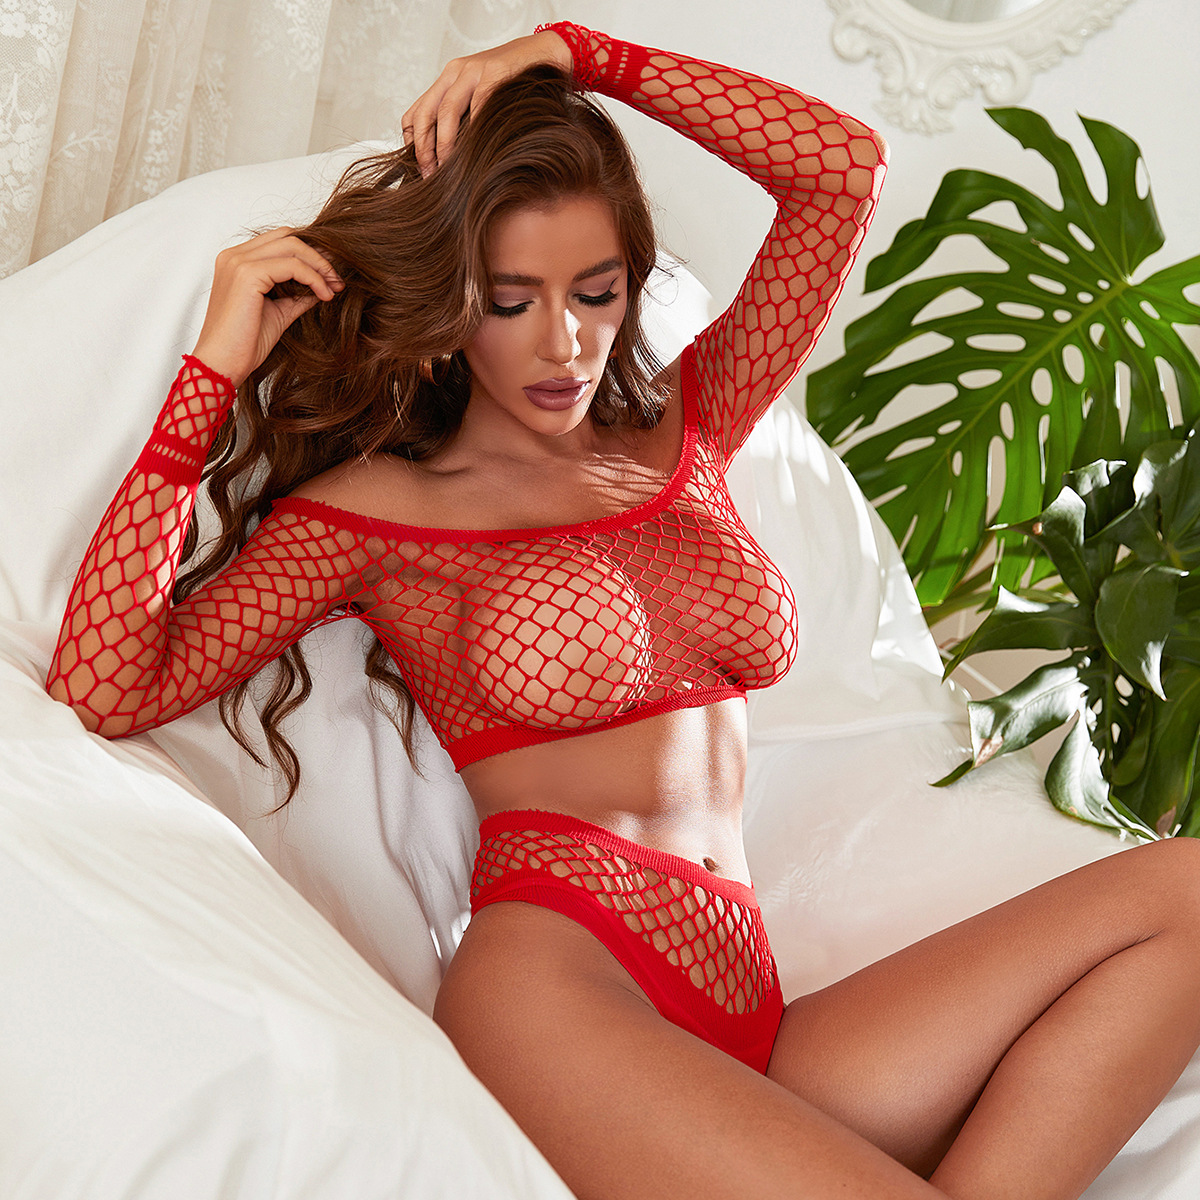 Porno Clothes Exotic Lingerie Set Fishnet Hollow Out Long Sleeve Bra Thong Set Women Sexy Panties Underwear Erotic Lingerie Set